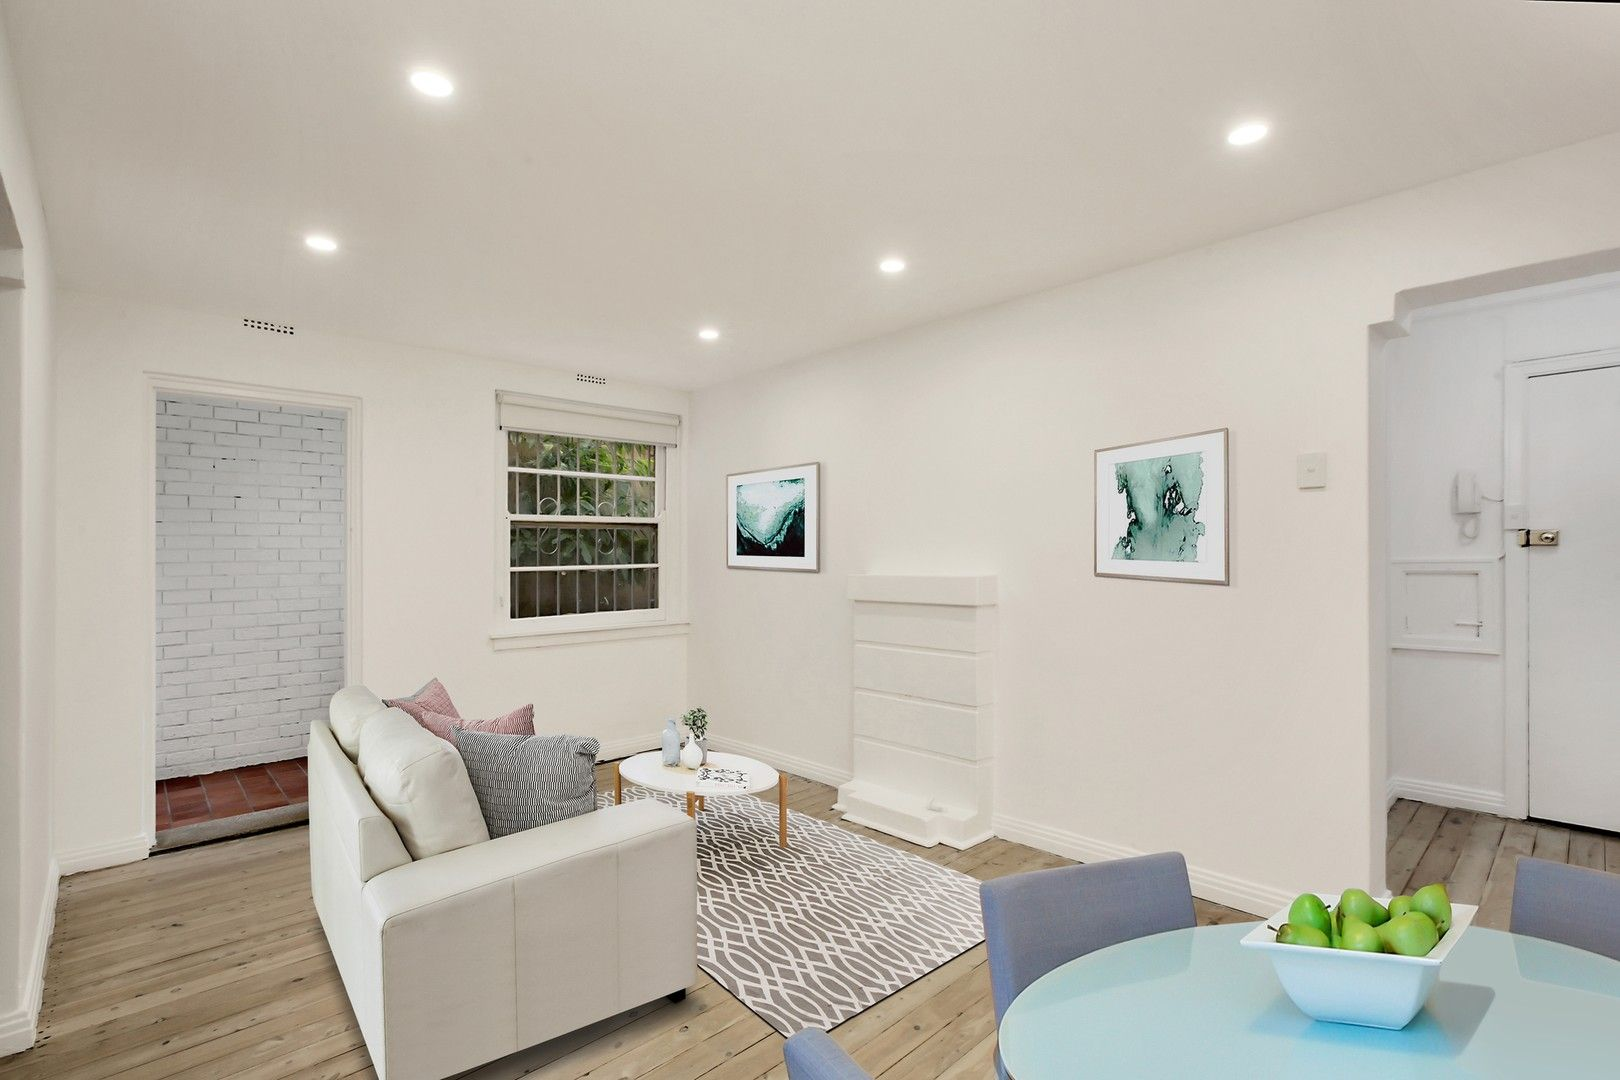 2 bedrooms Apartment / Unit / Flat in 4/21B Billyard Avenue ELIZABETH BAY NSW, 2011